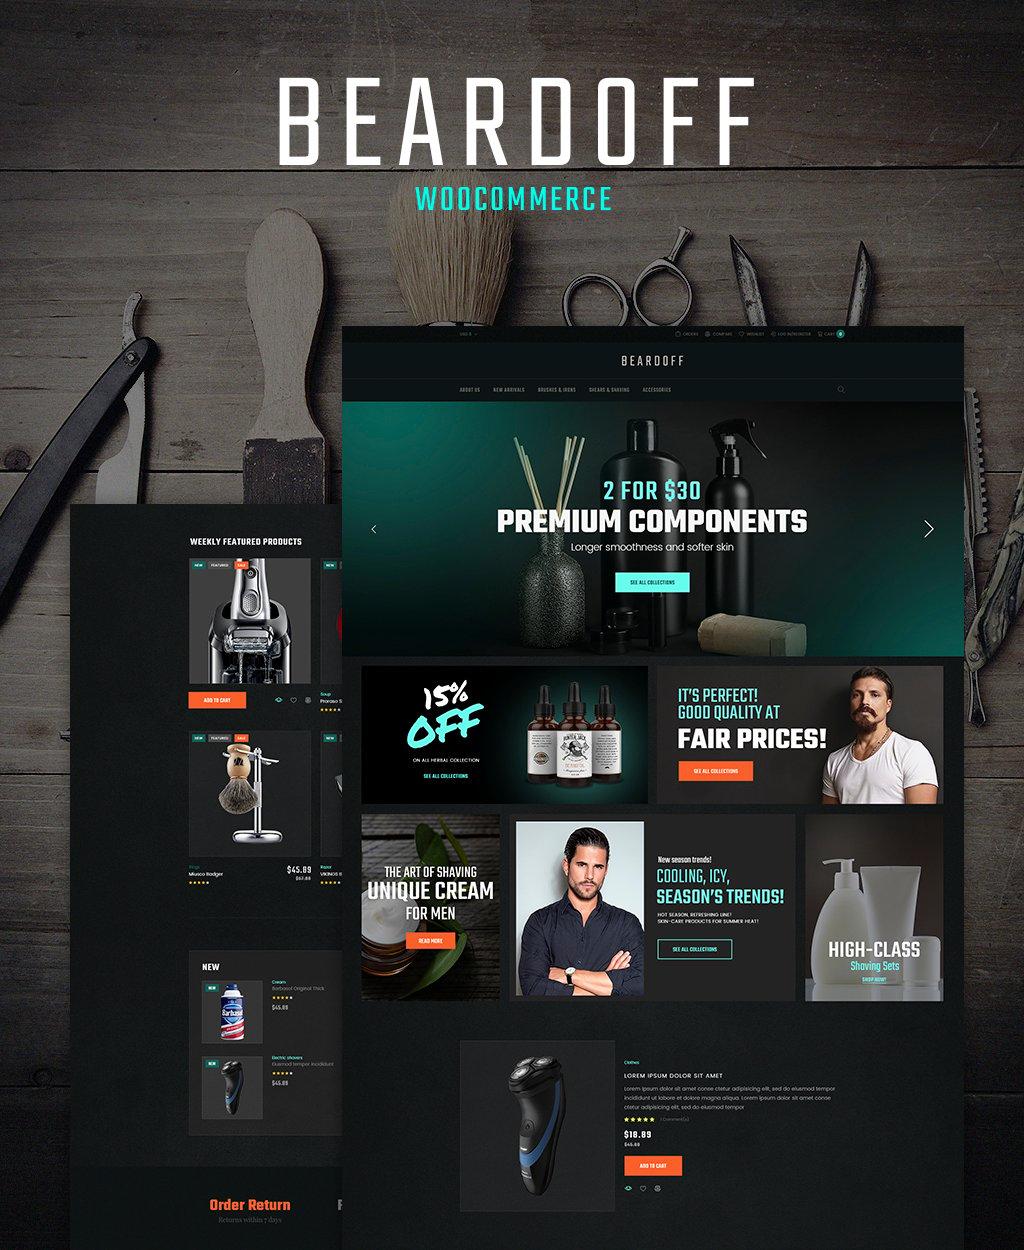 Beardoff - Men's Shaving Products Responsive WooCommerce Theme WooCommerce Theme - screenshot